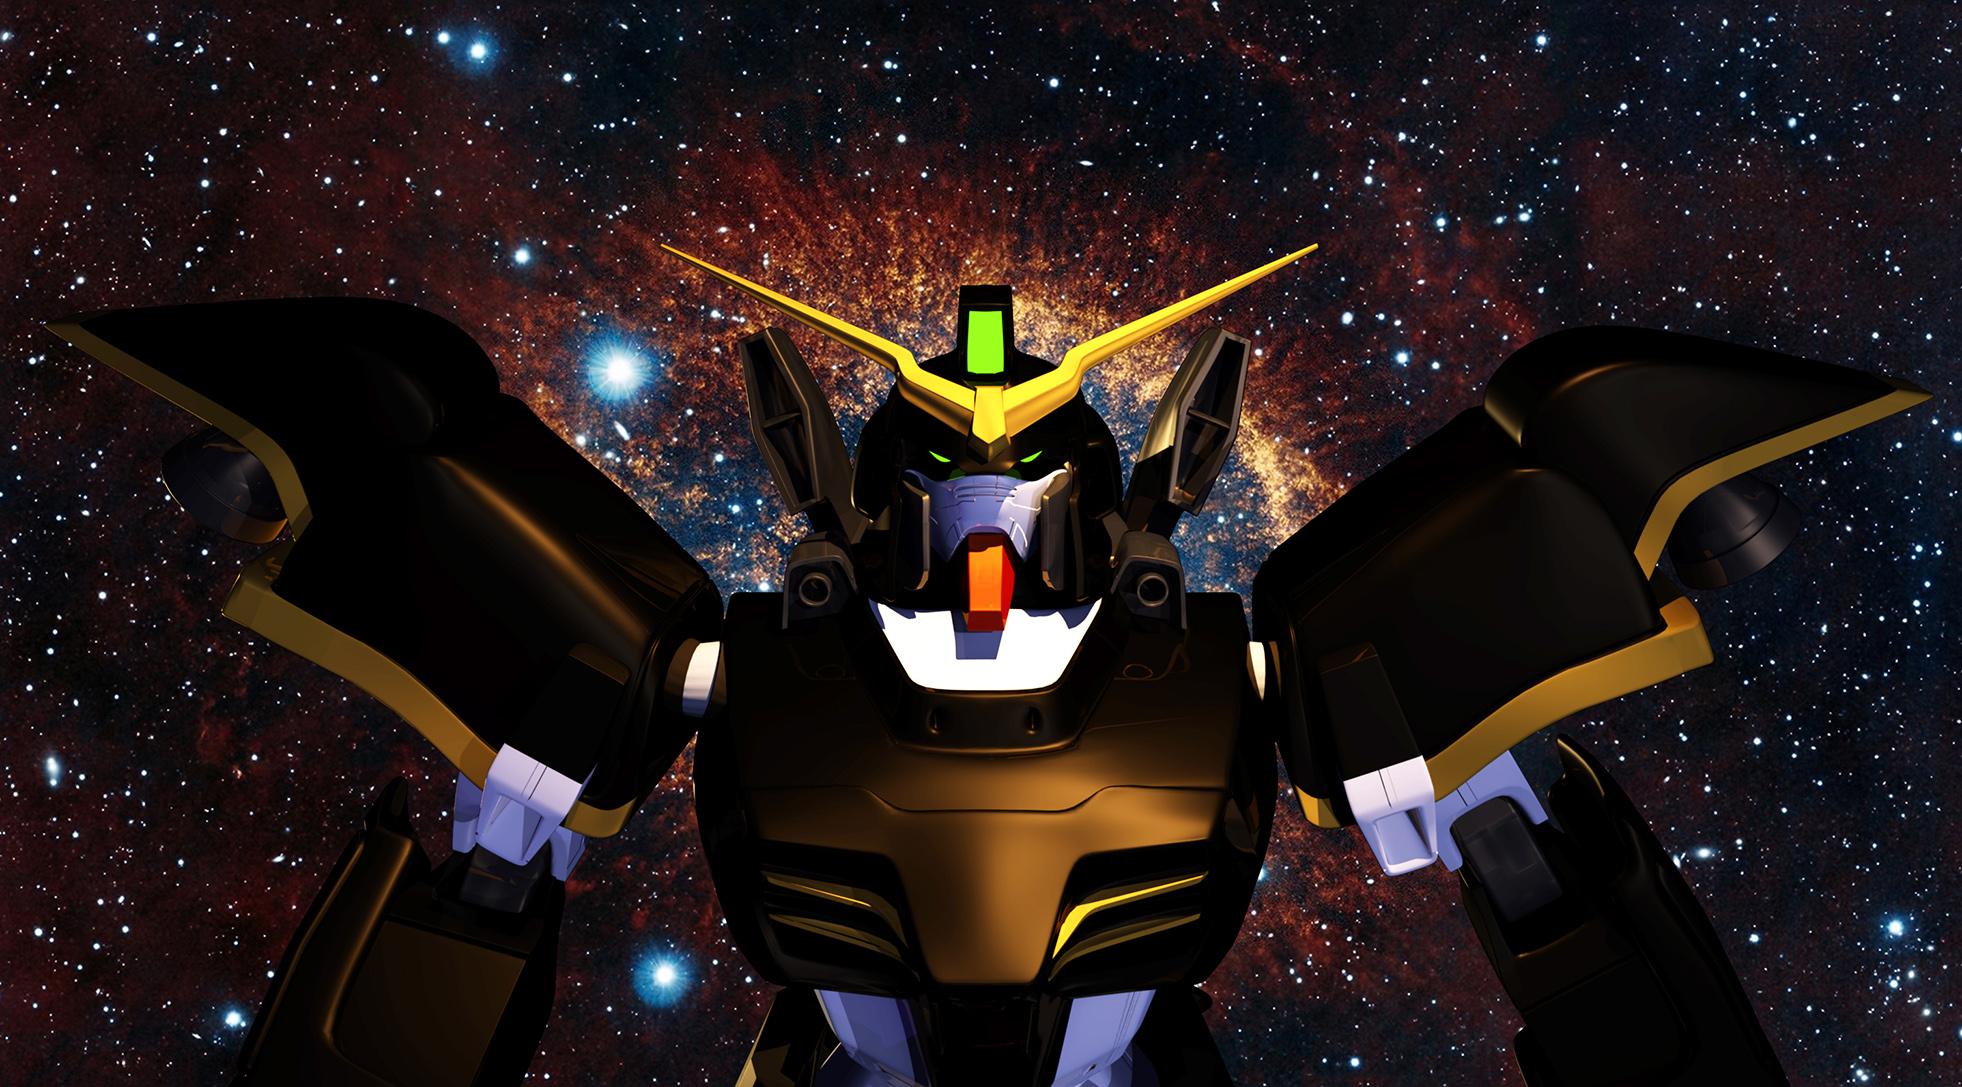 Gundam 23a1.jpg